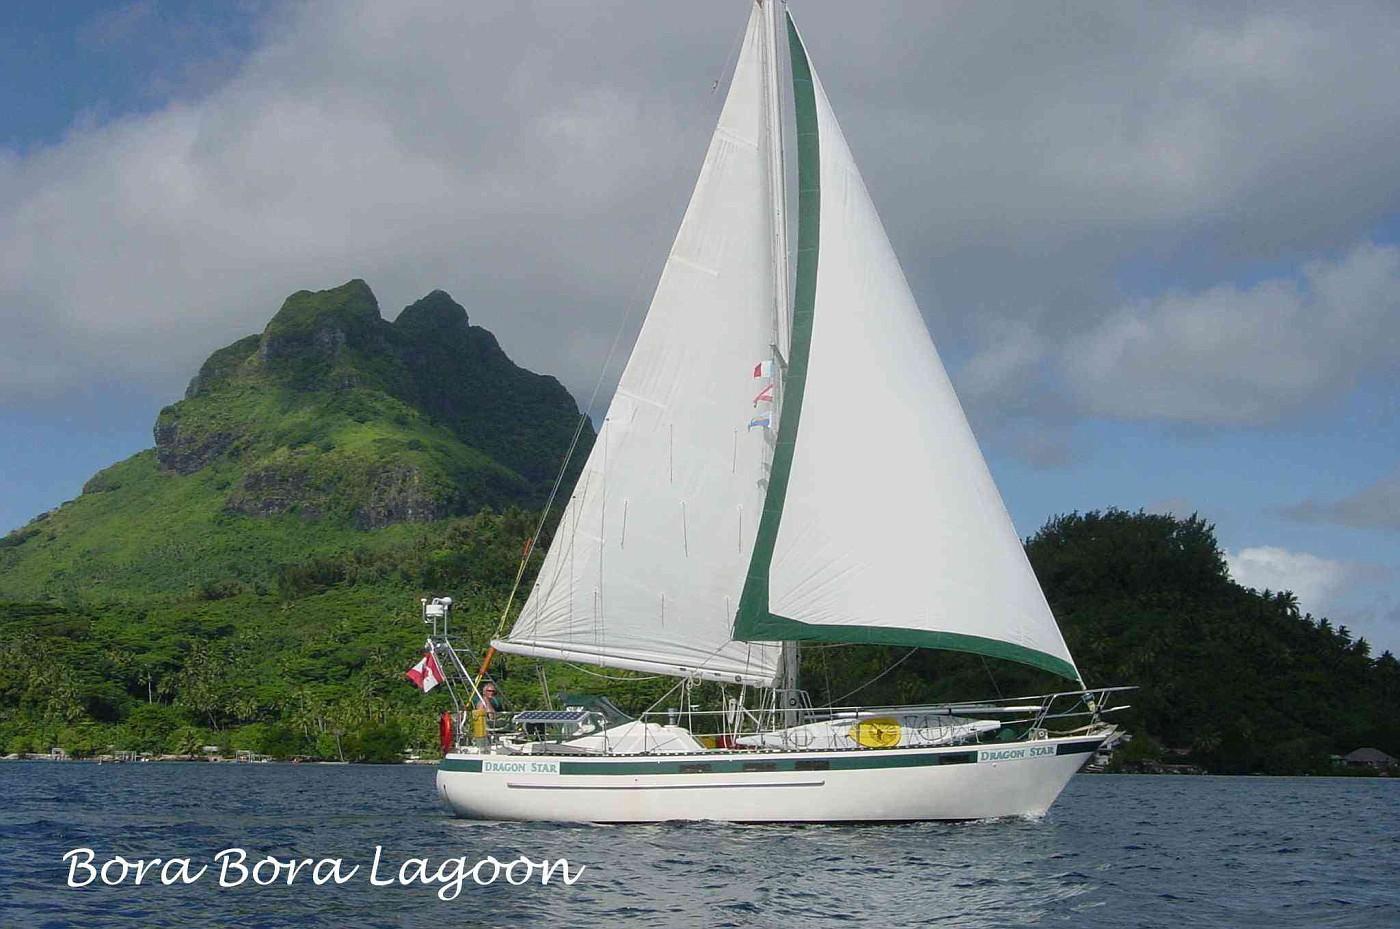 038 - Dragon Star - Bora Bora Lagoon